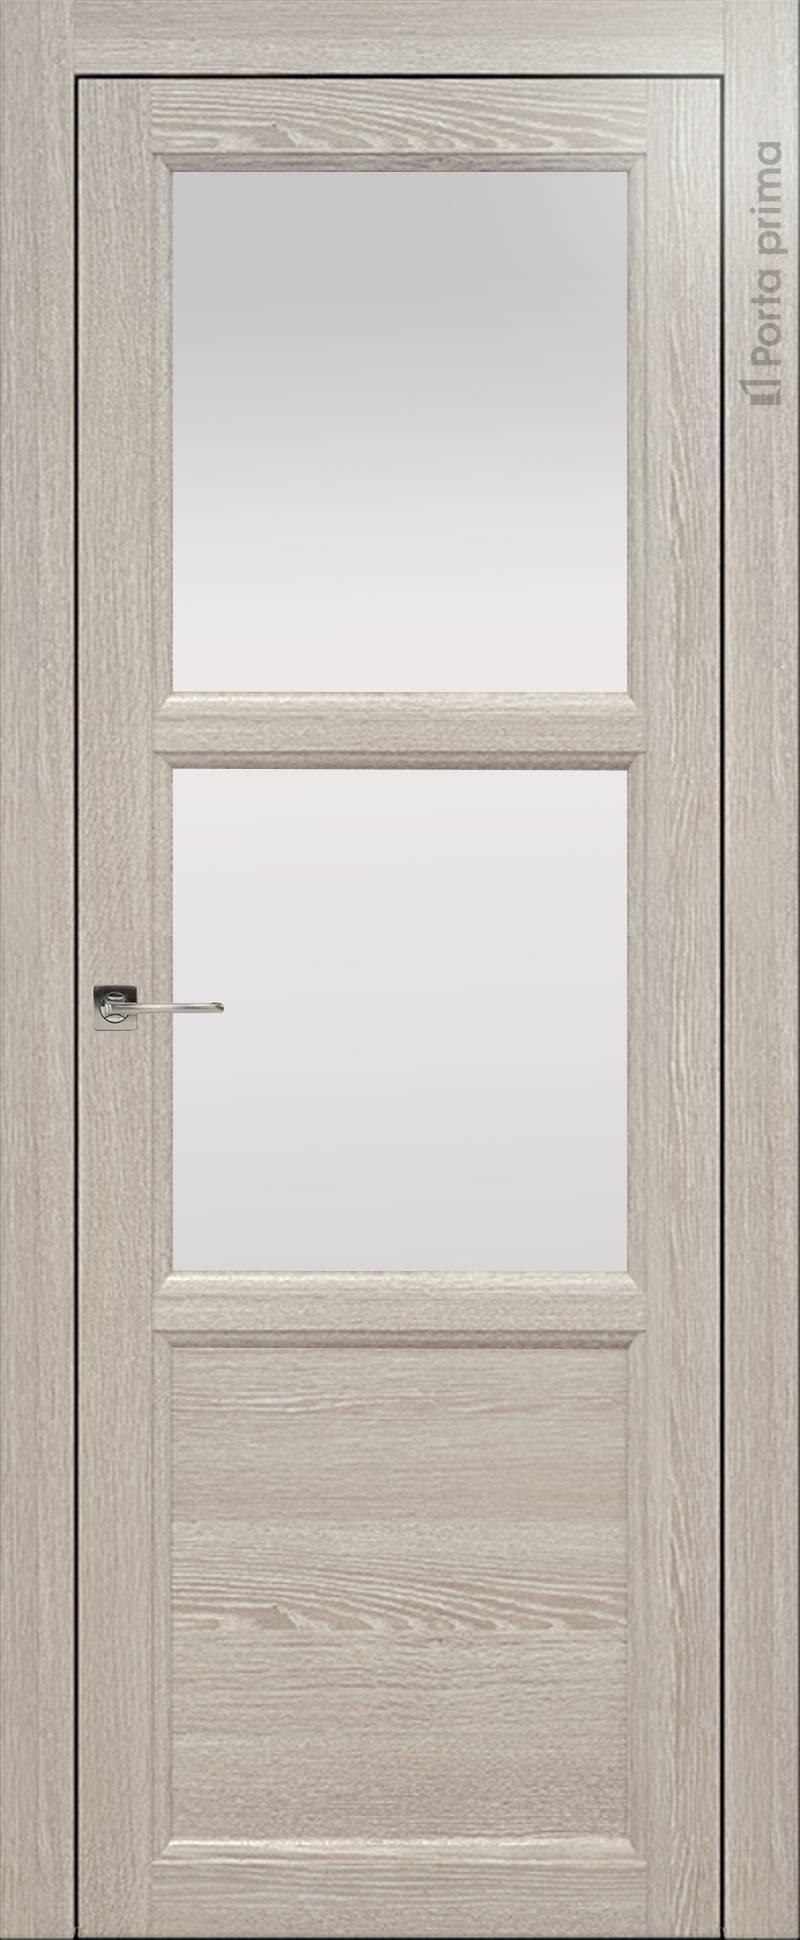 Sorrento-R Б2 цвет - Серый дуб Со стеклом (ДО)